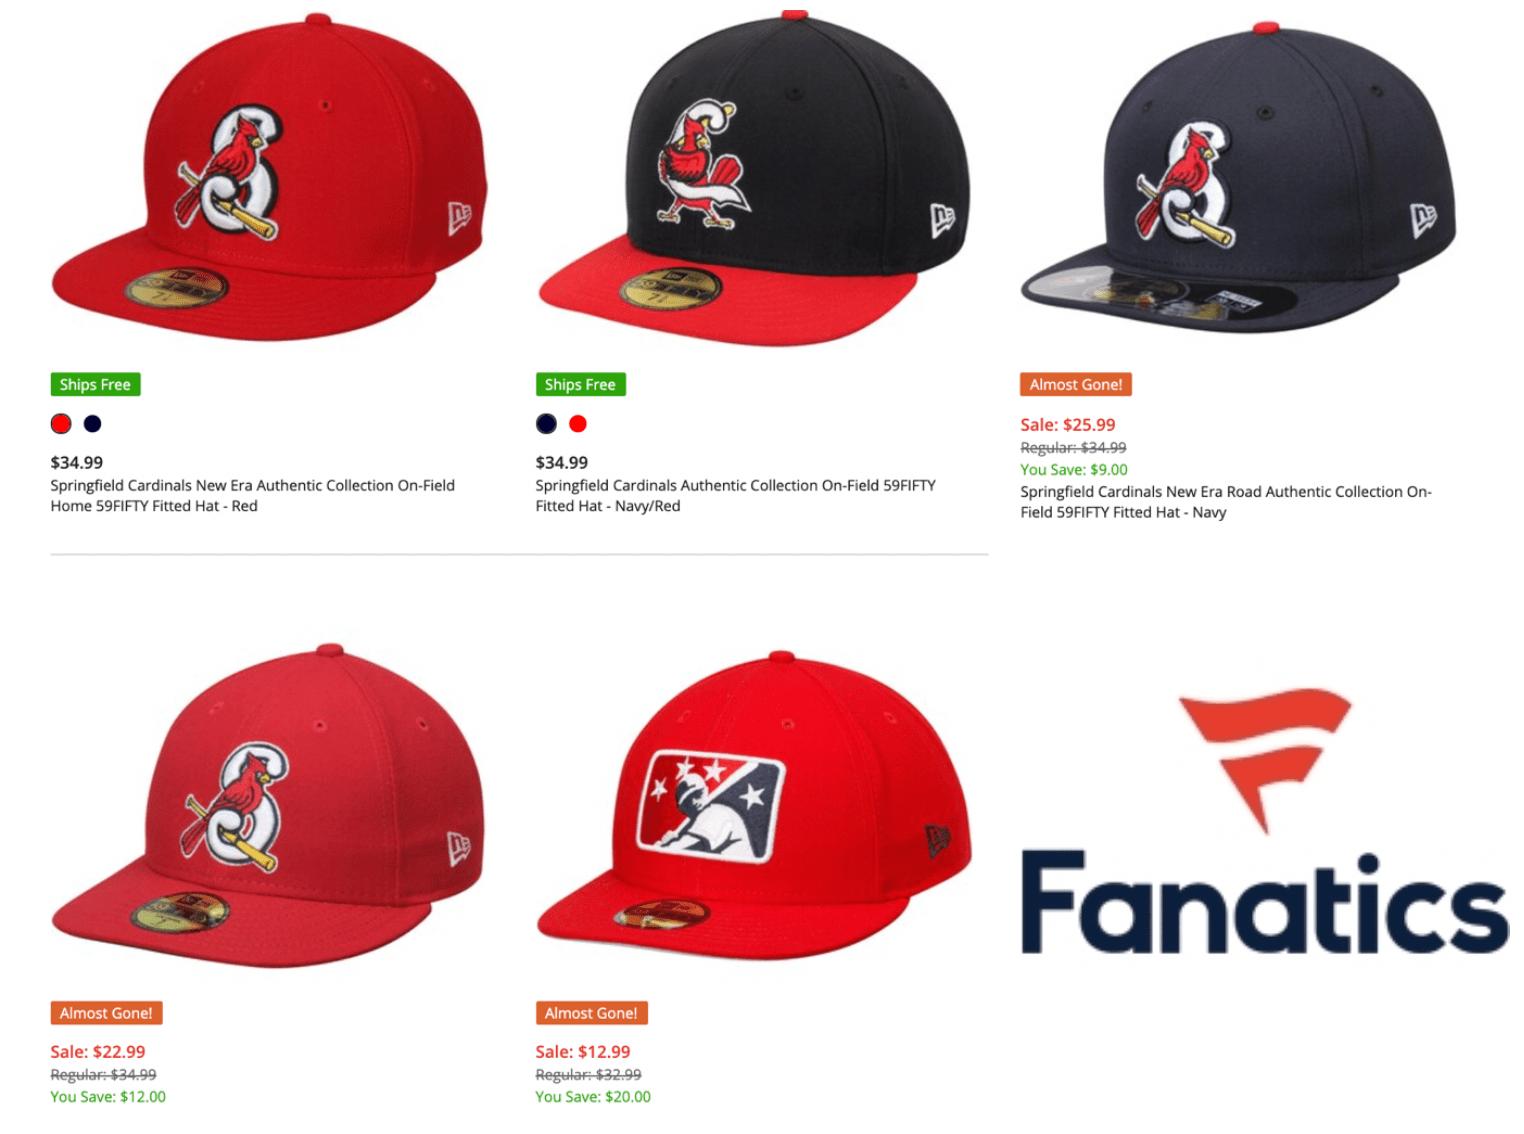 Springfield Cardinals Fanatics ad